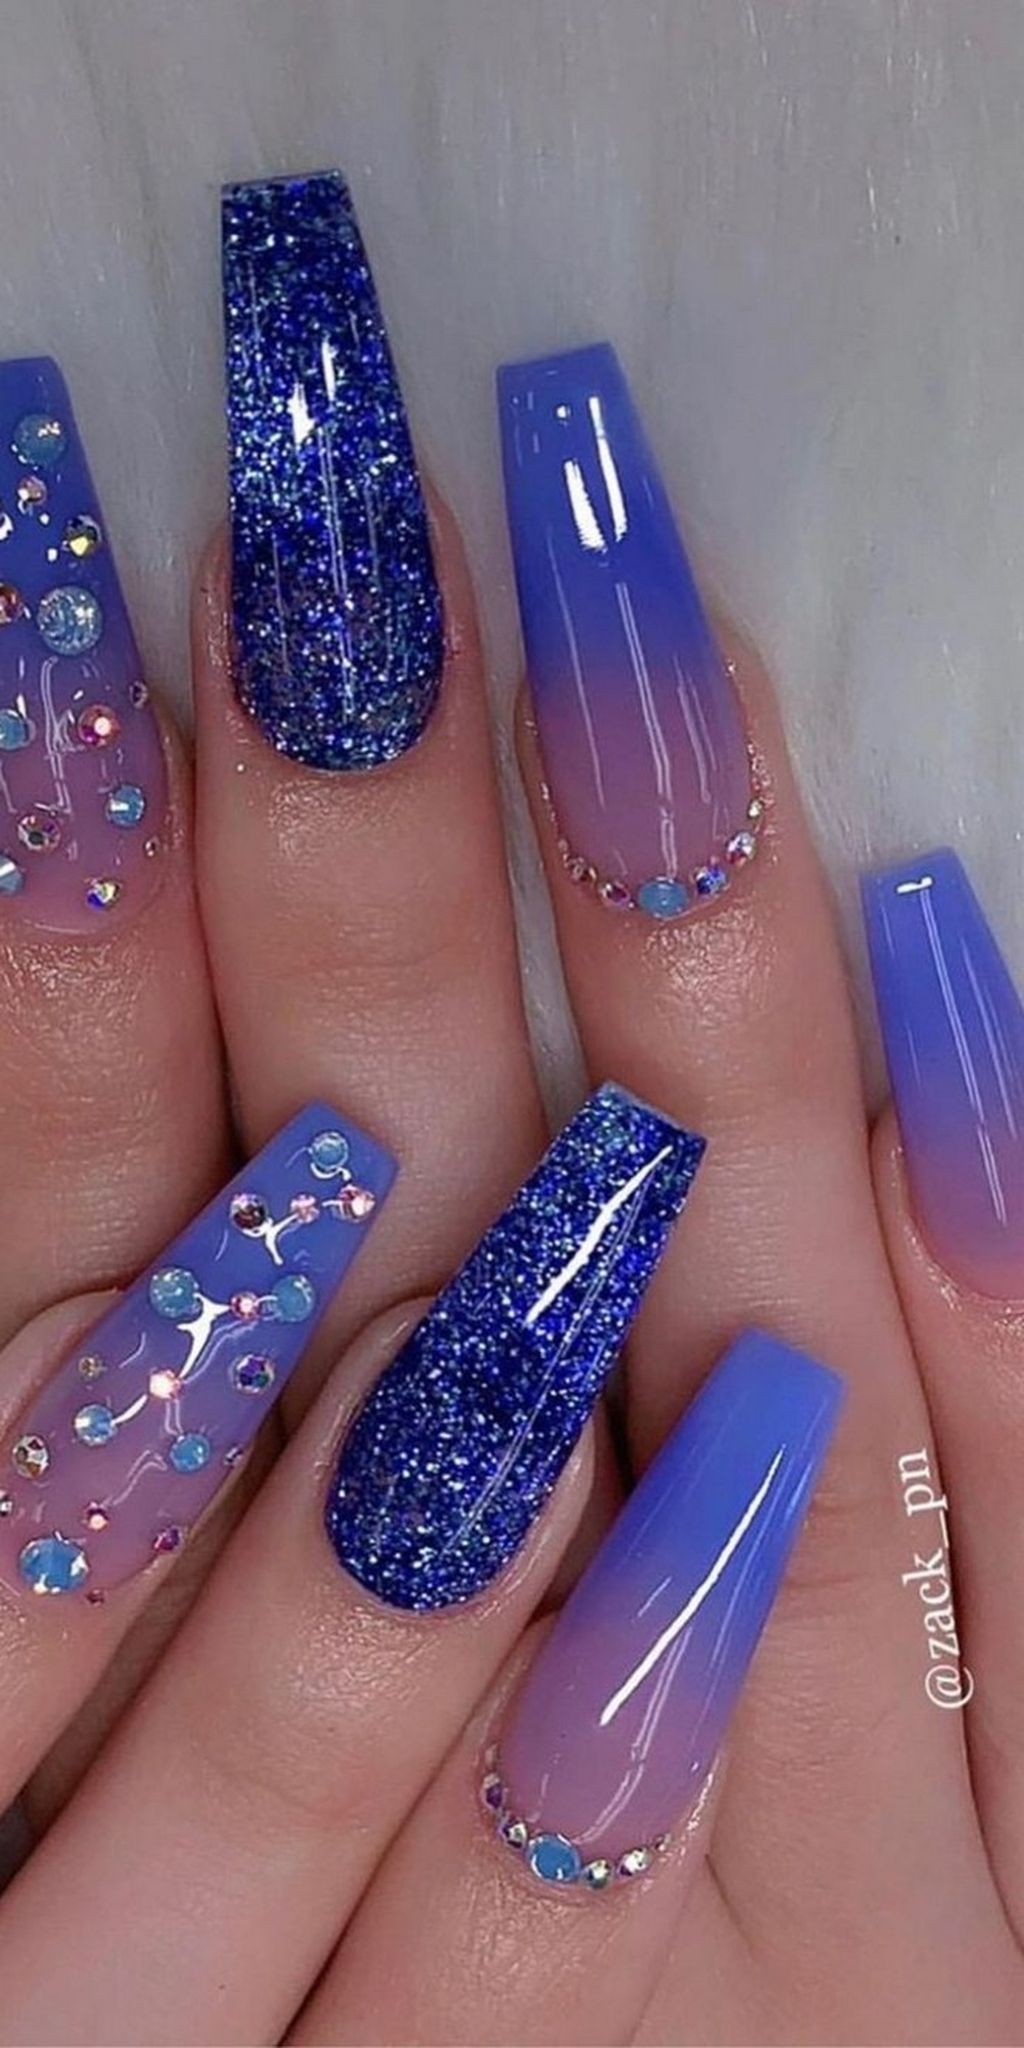 20 Charming Acrylic Nail Designs To